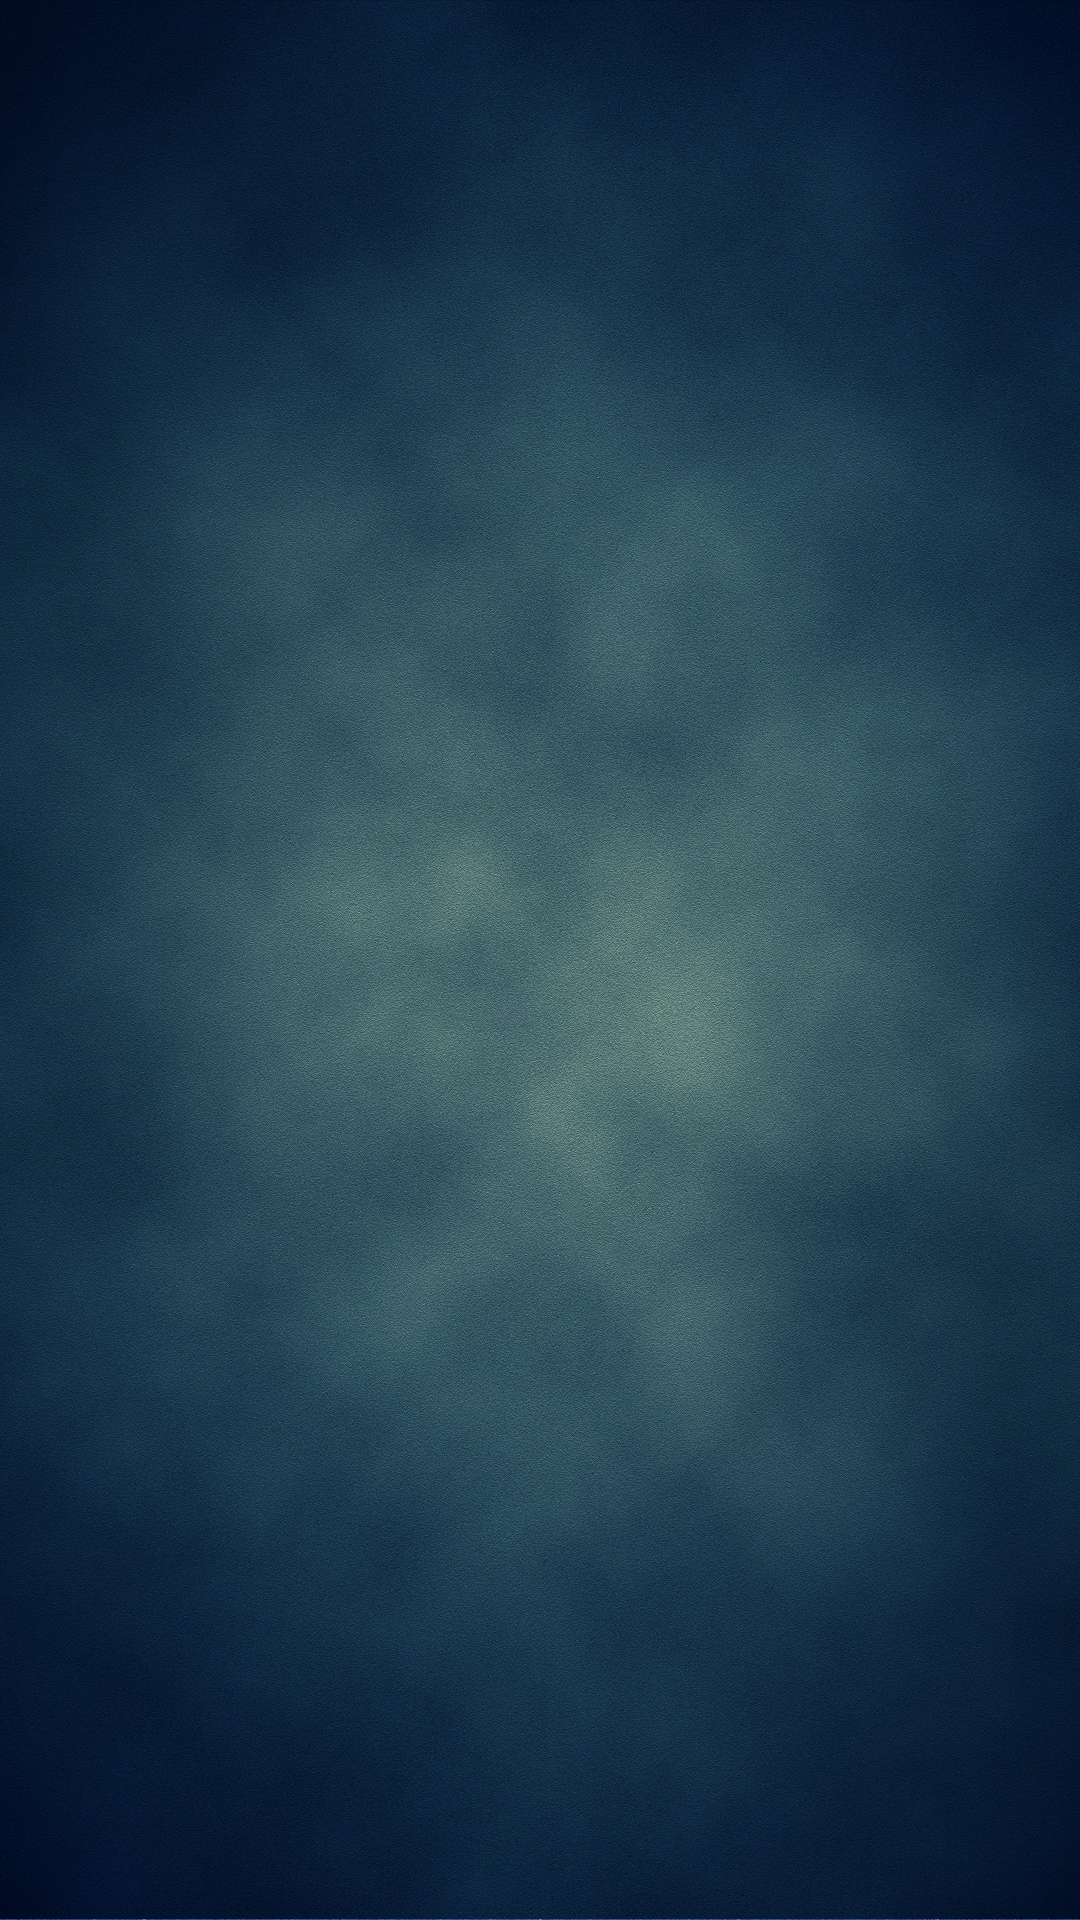 Blue htc one wallpaper